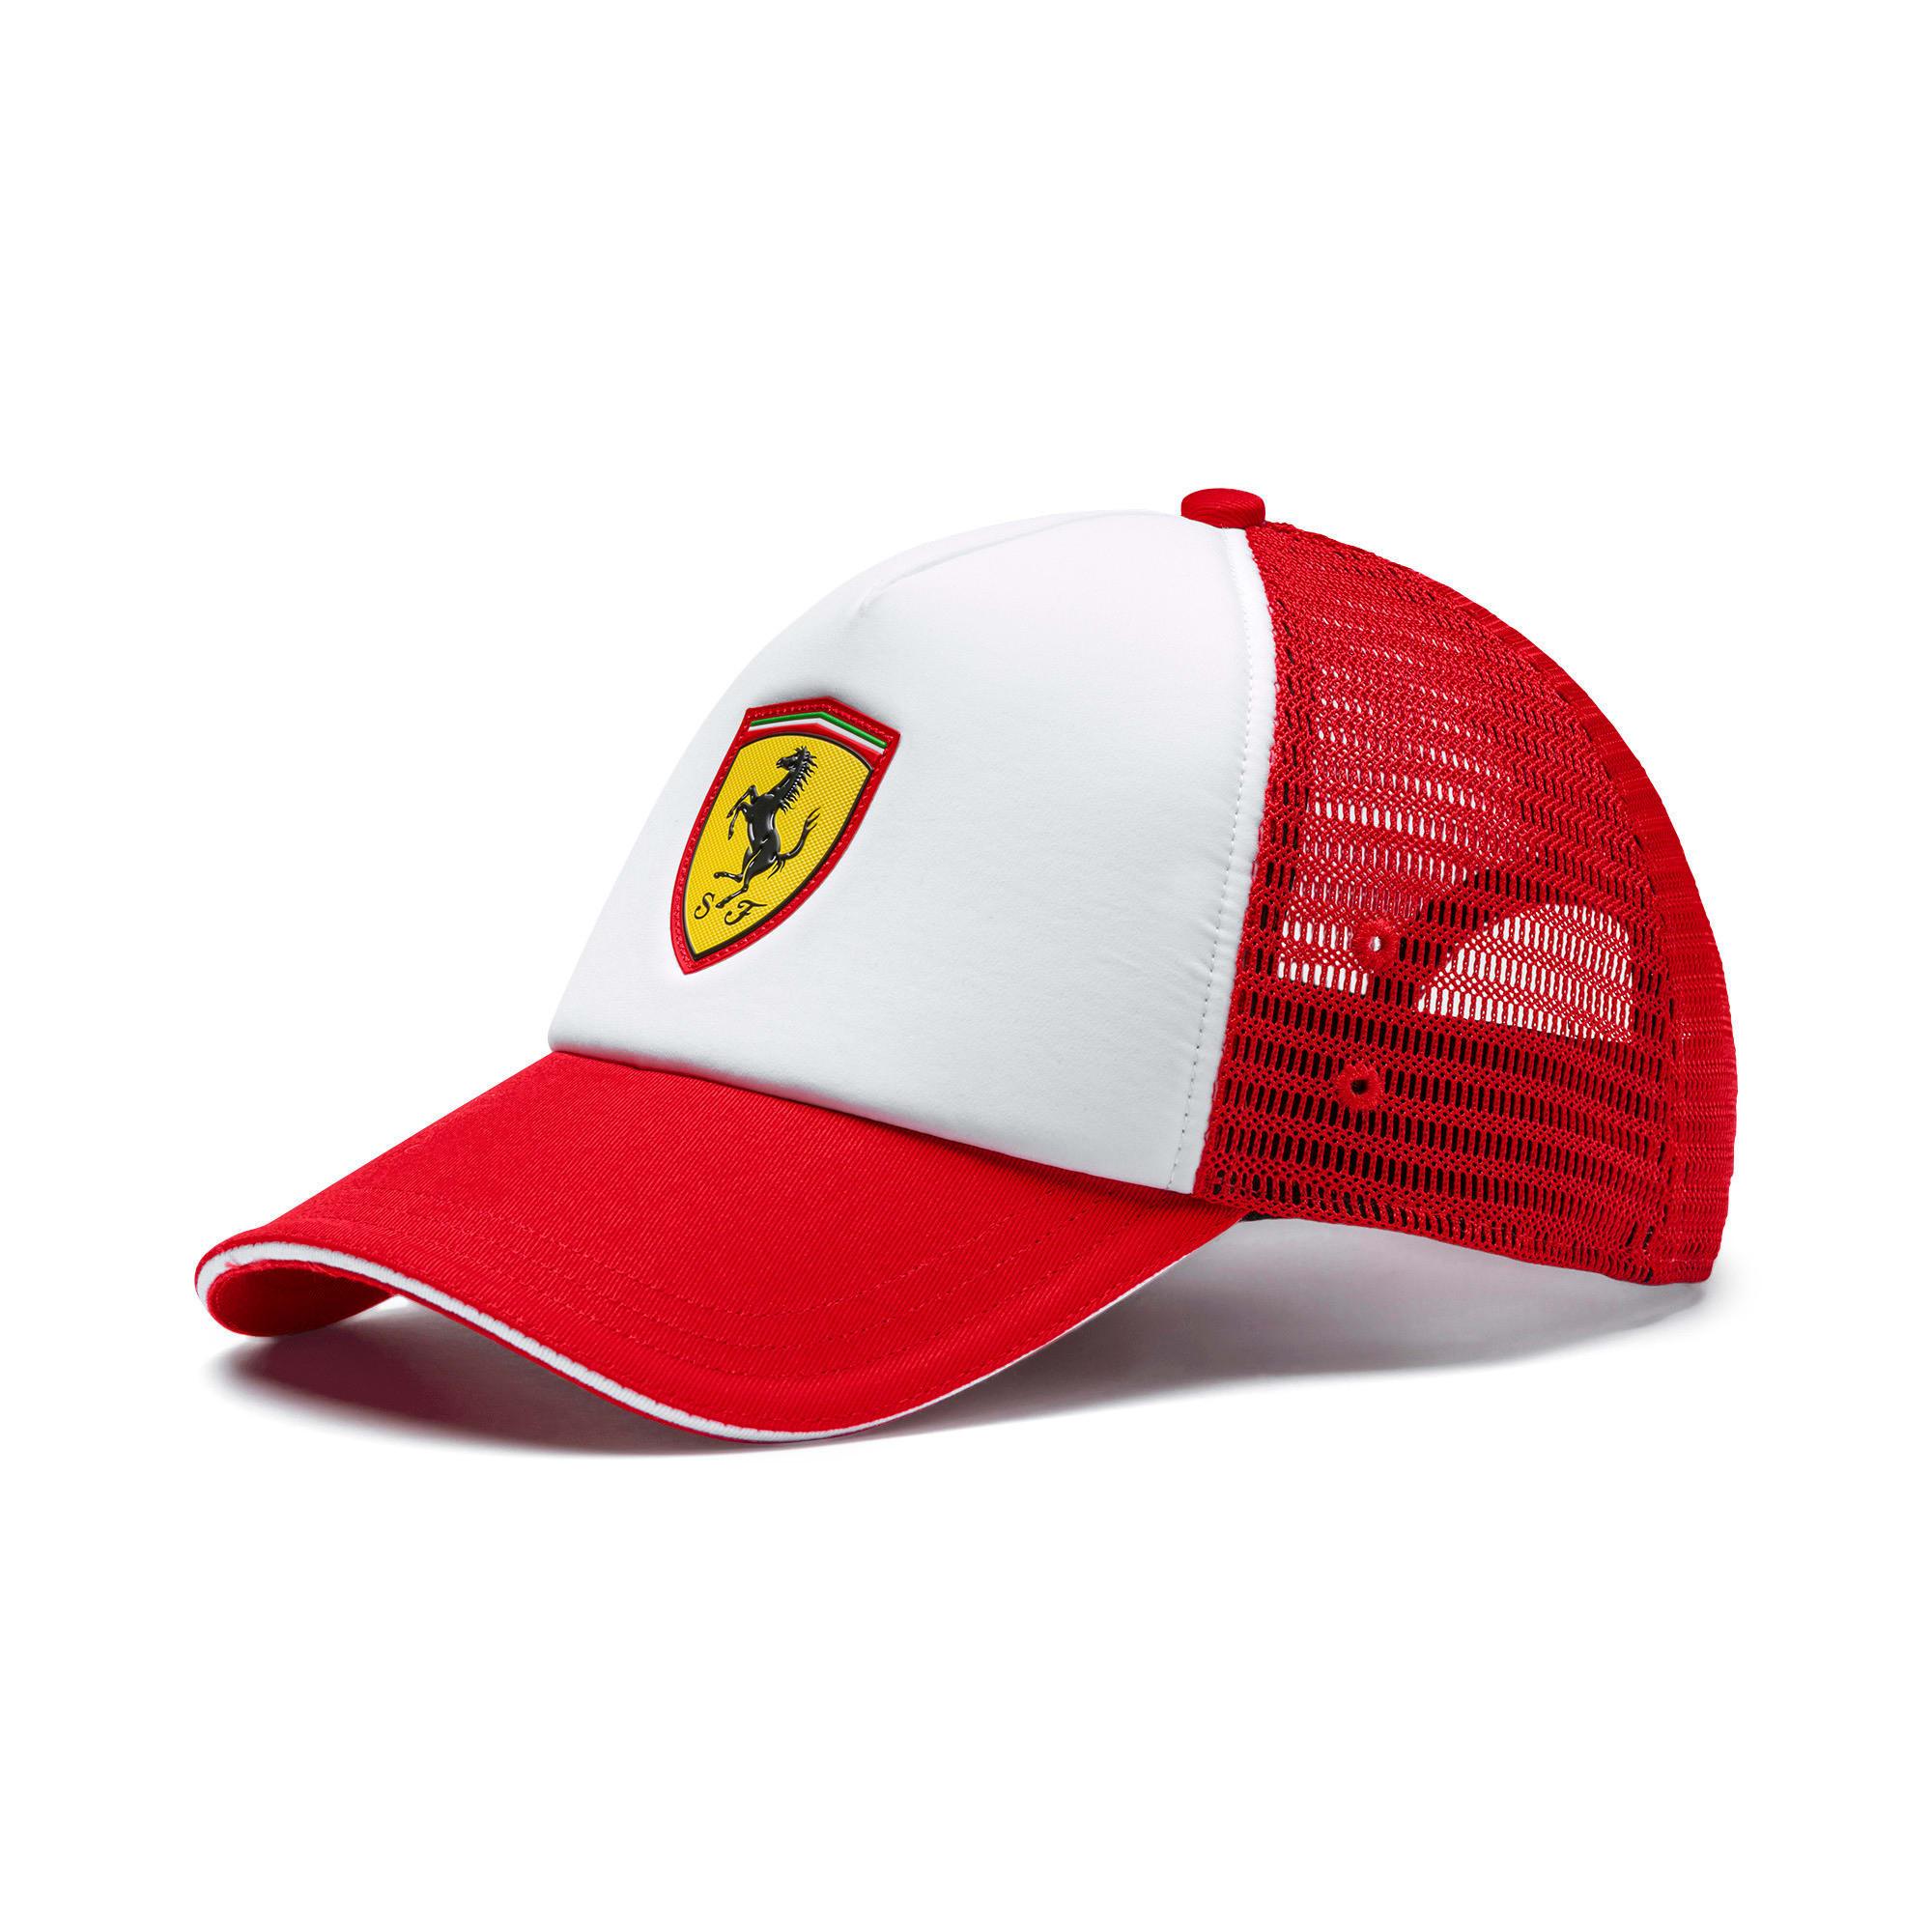 Thumbnail 1 of Scuderia Ferrari Fanwear Trucker BB Cap, Rosso Corsa, medium